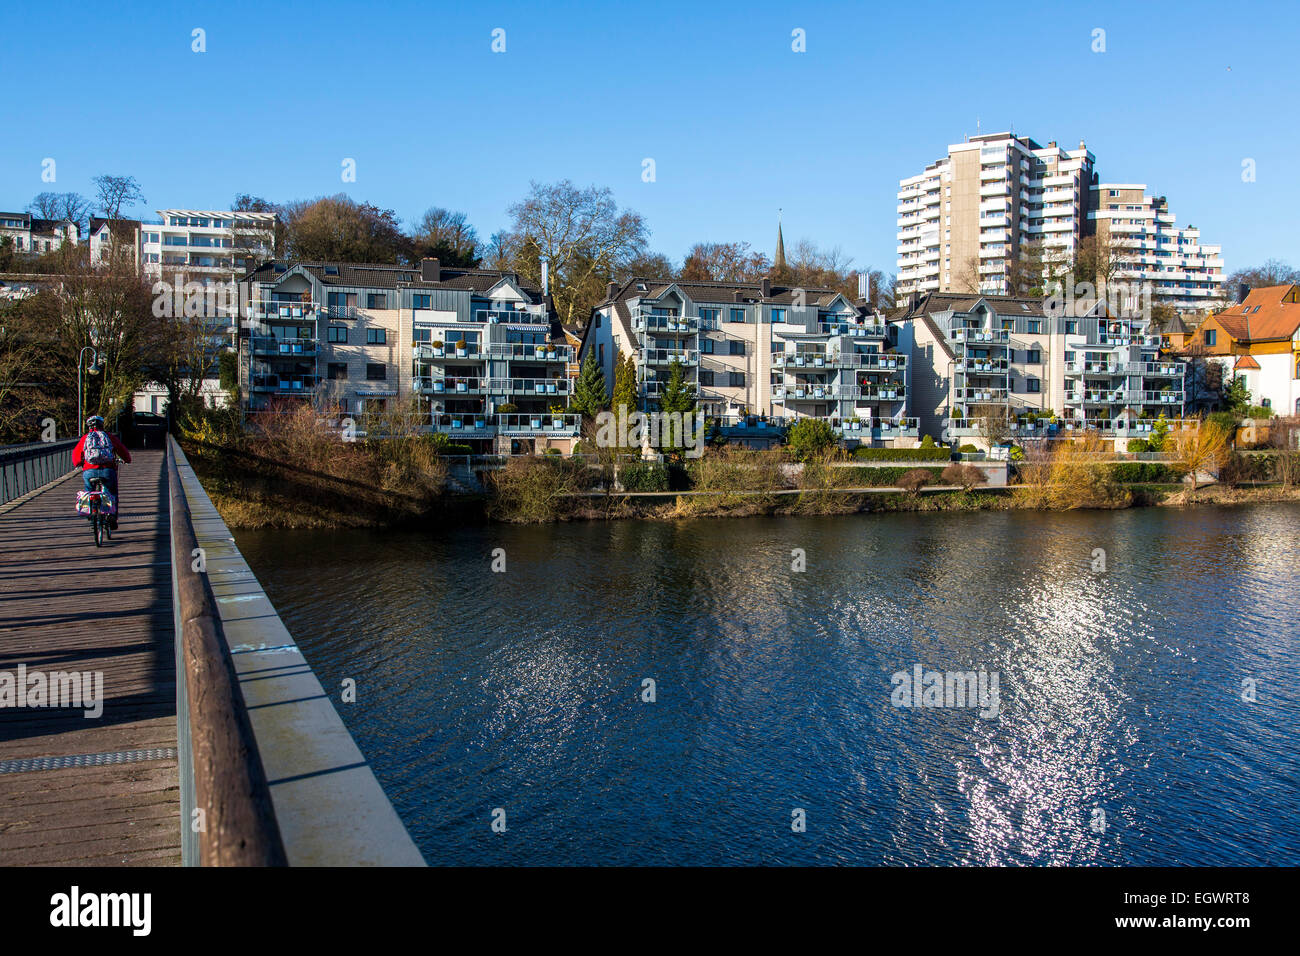 City center, Mülheim, river Ruhr, bridges, Stock Photo